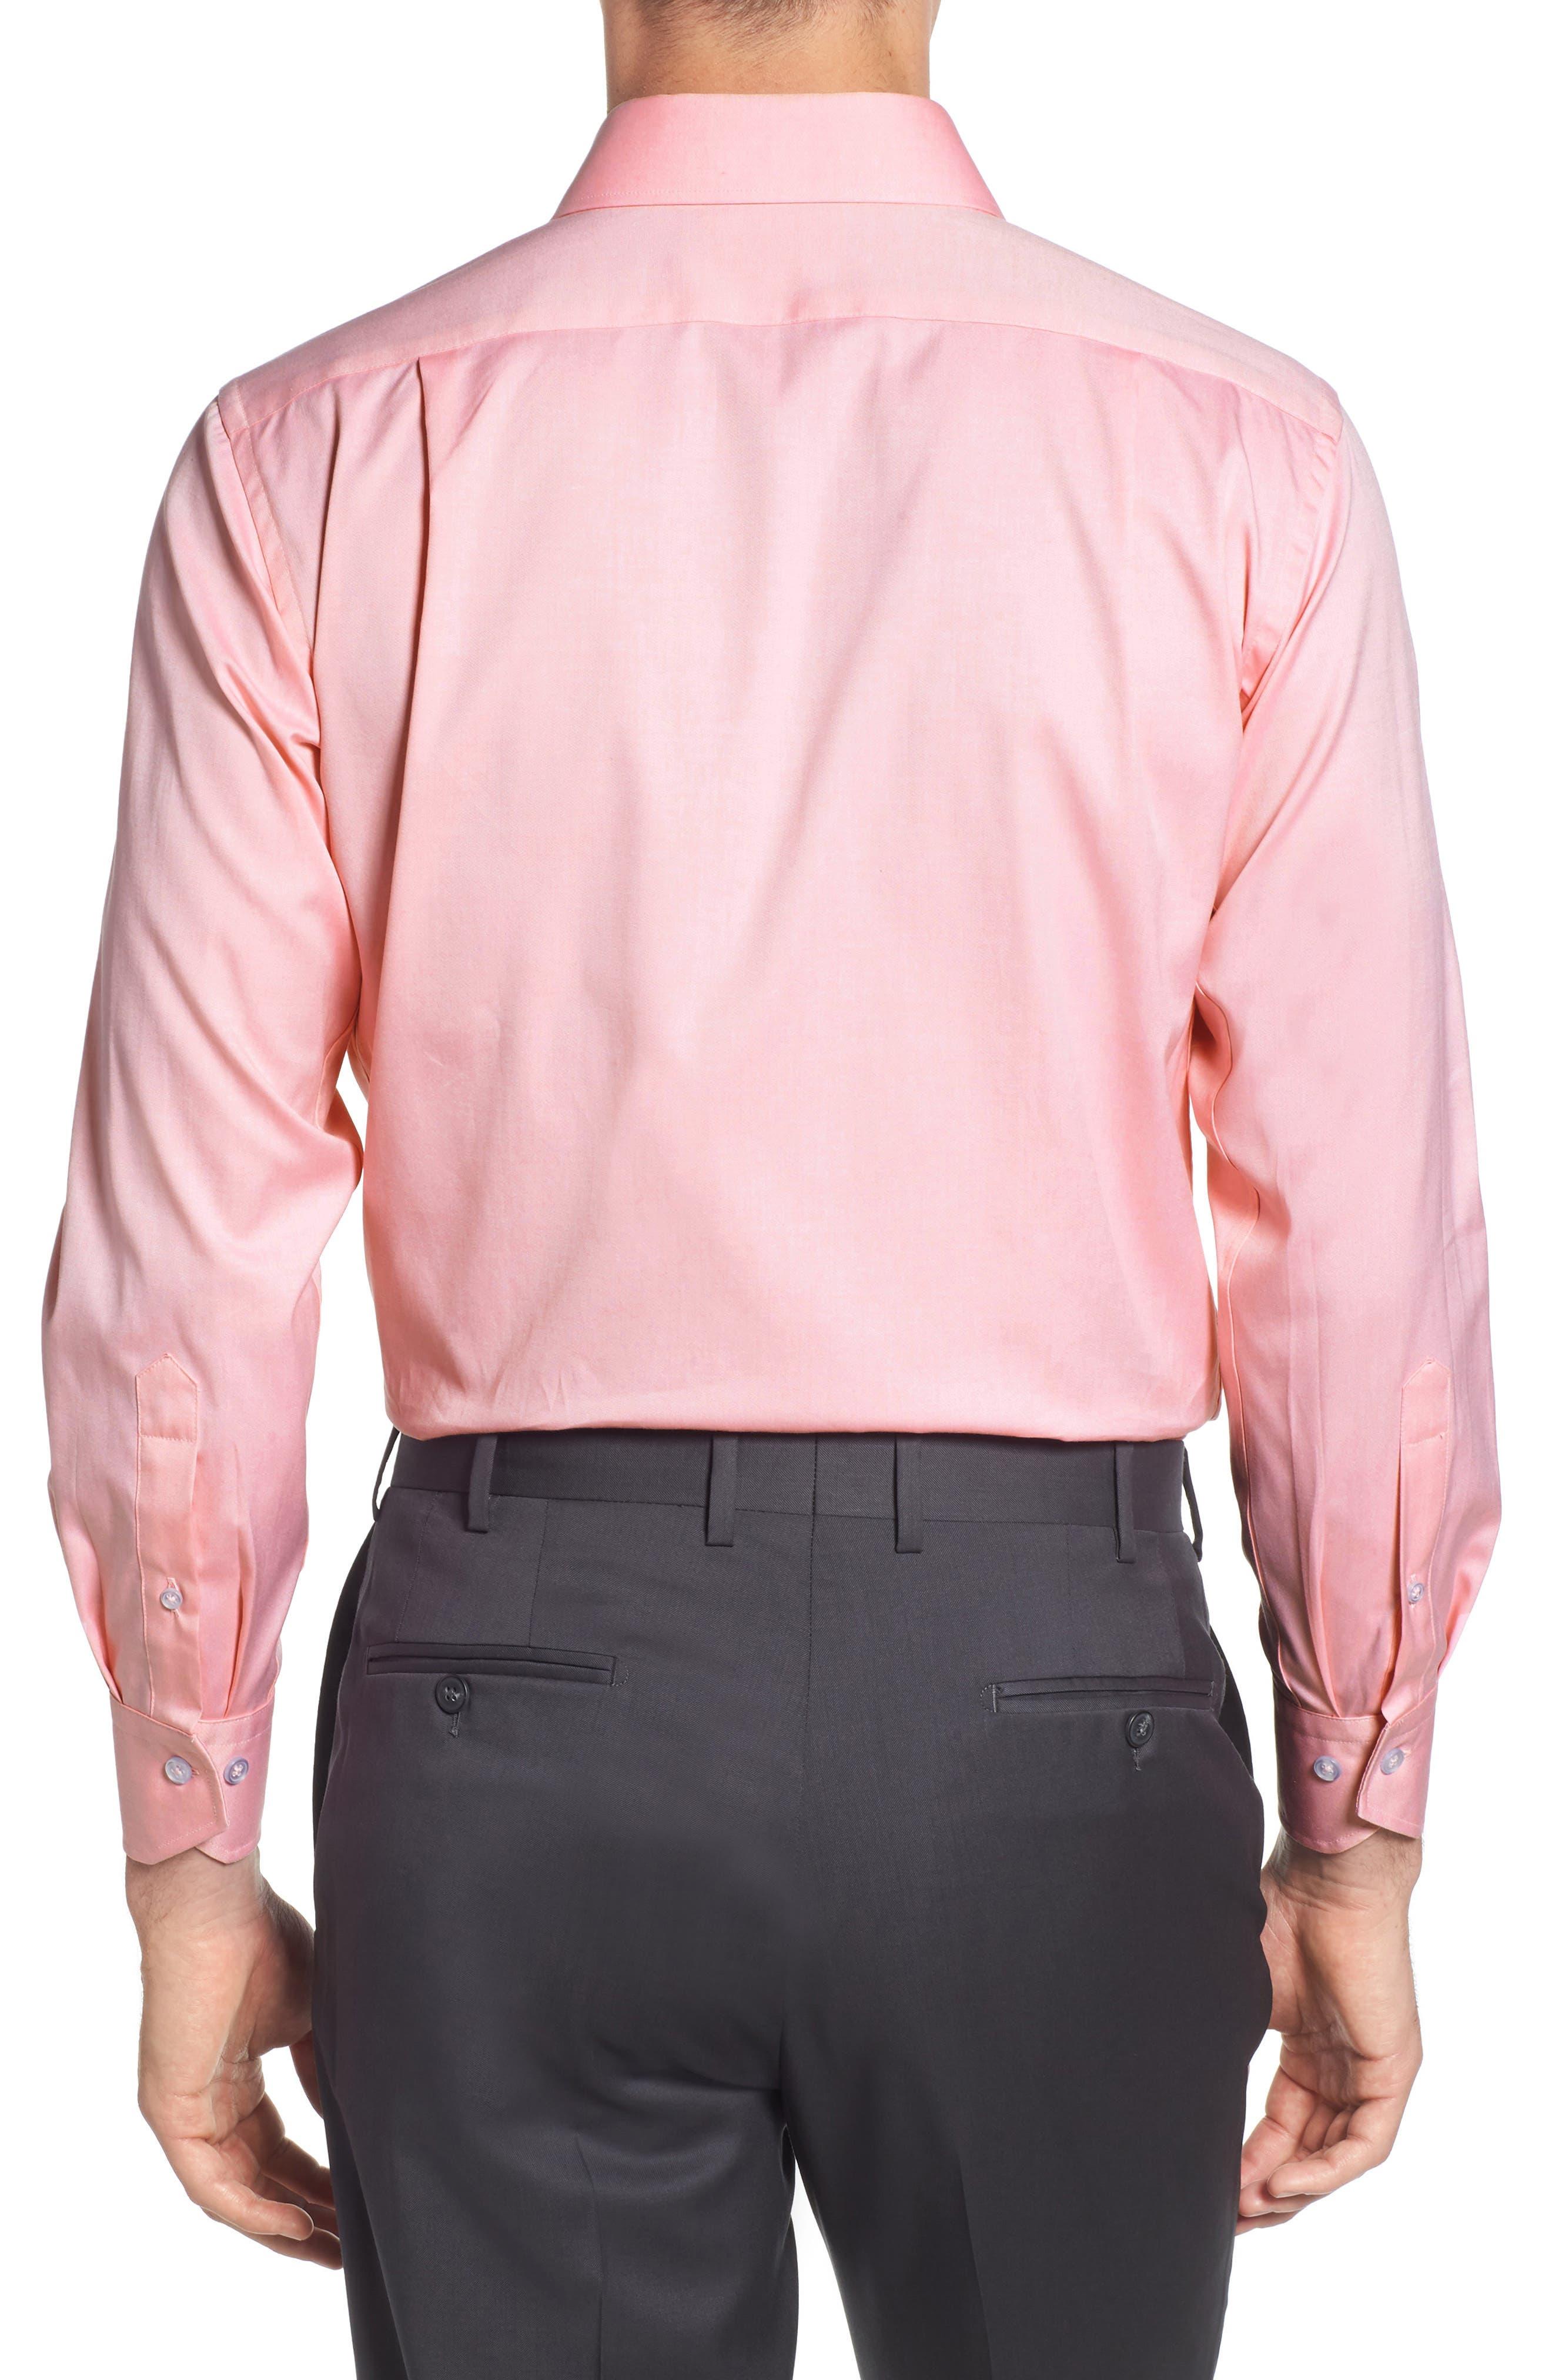 Trim Fit Solid Dress Shirt,                             Alternate thumbnail 3, color,                             PINK